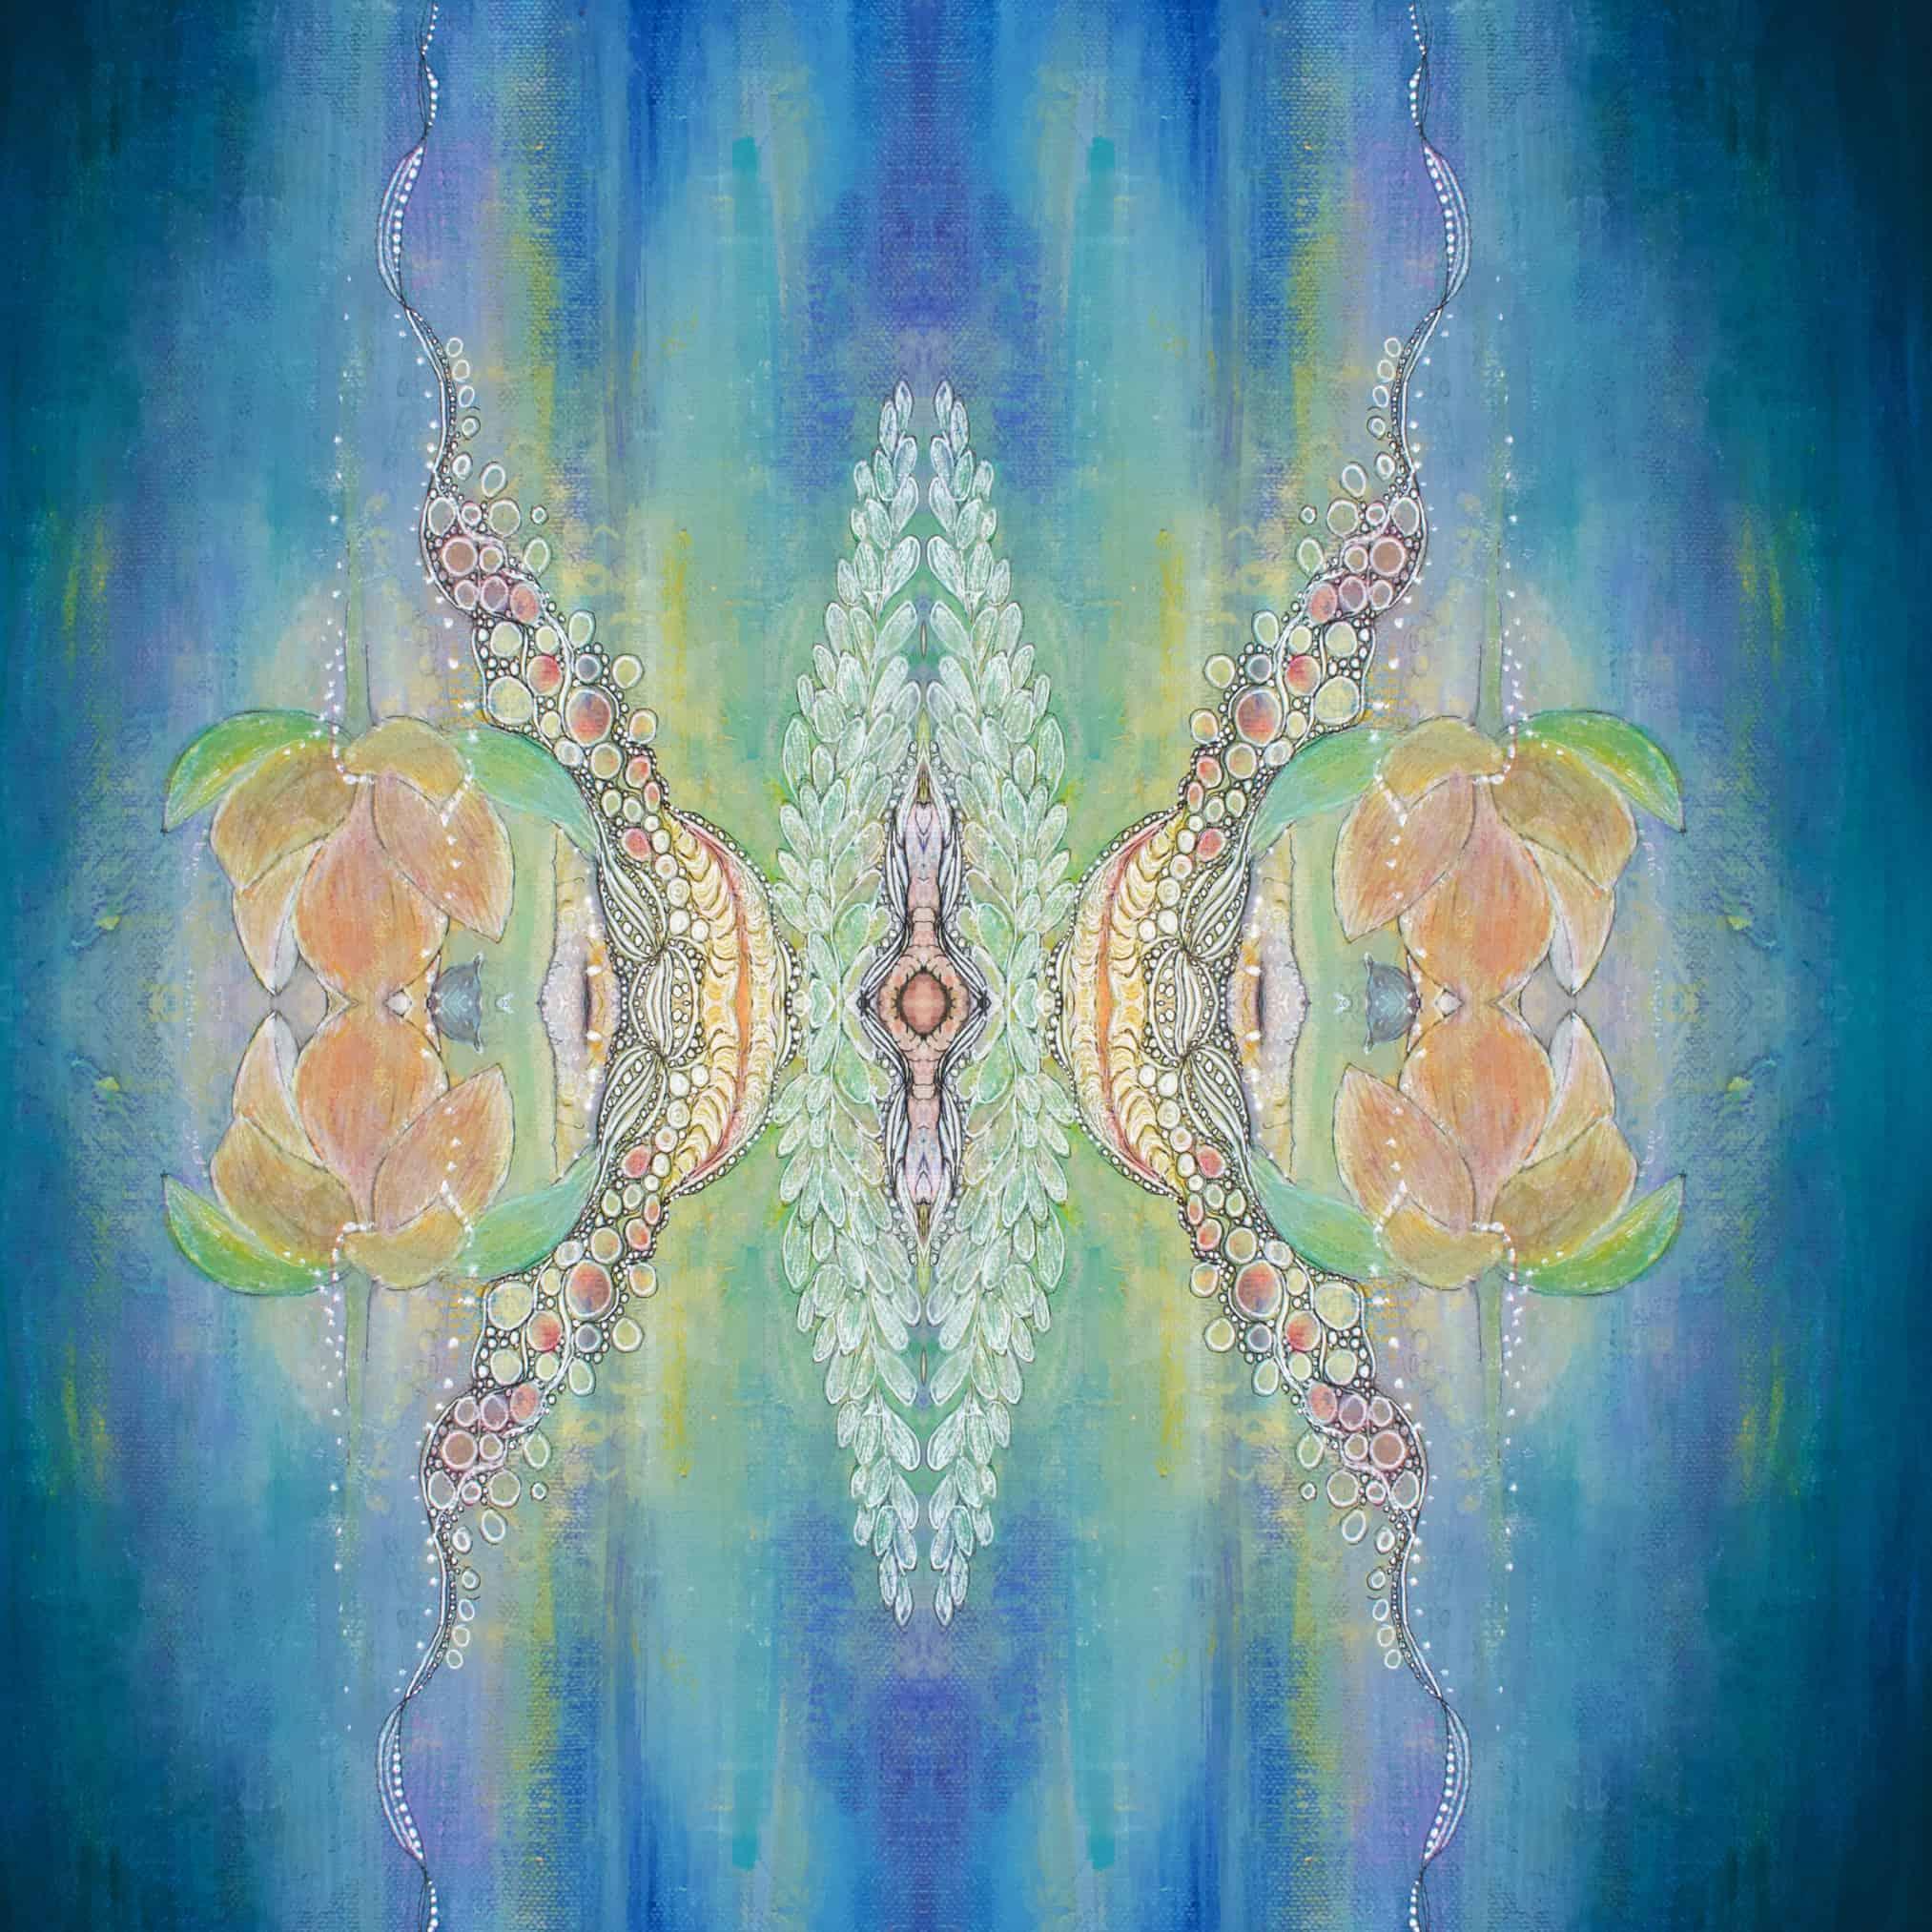 Moon Goddess sexuality mandala